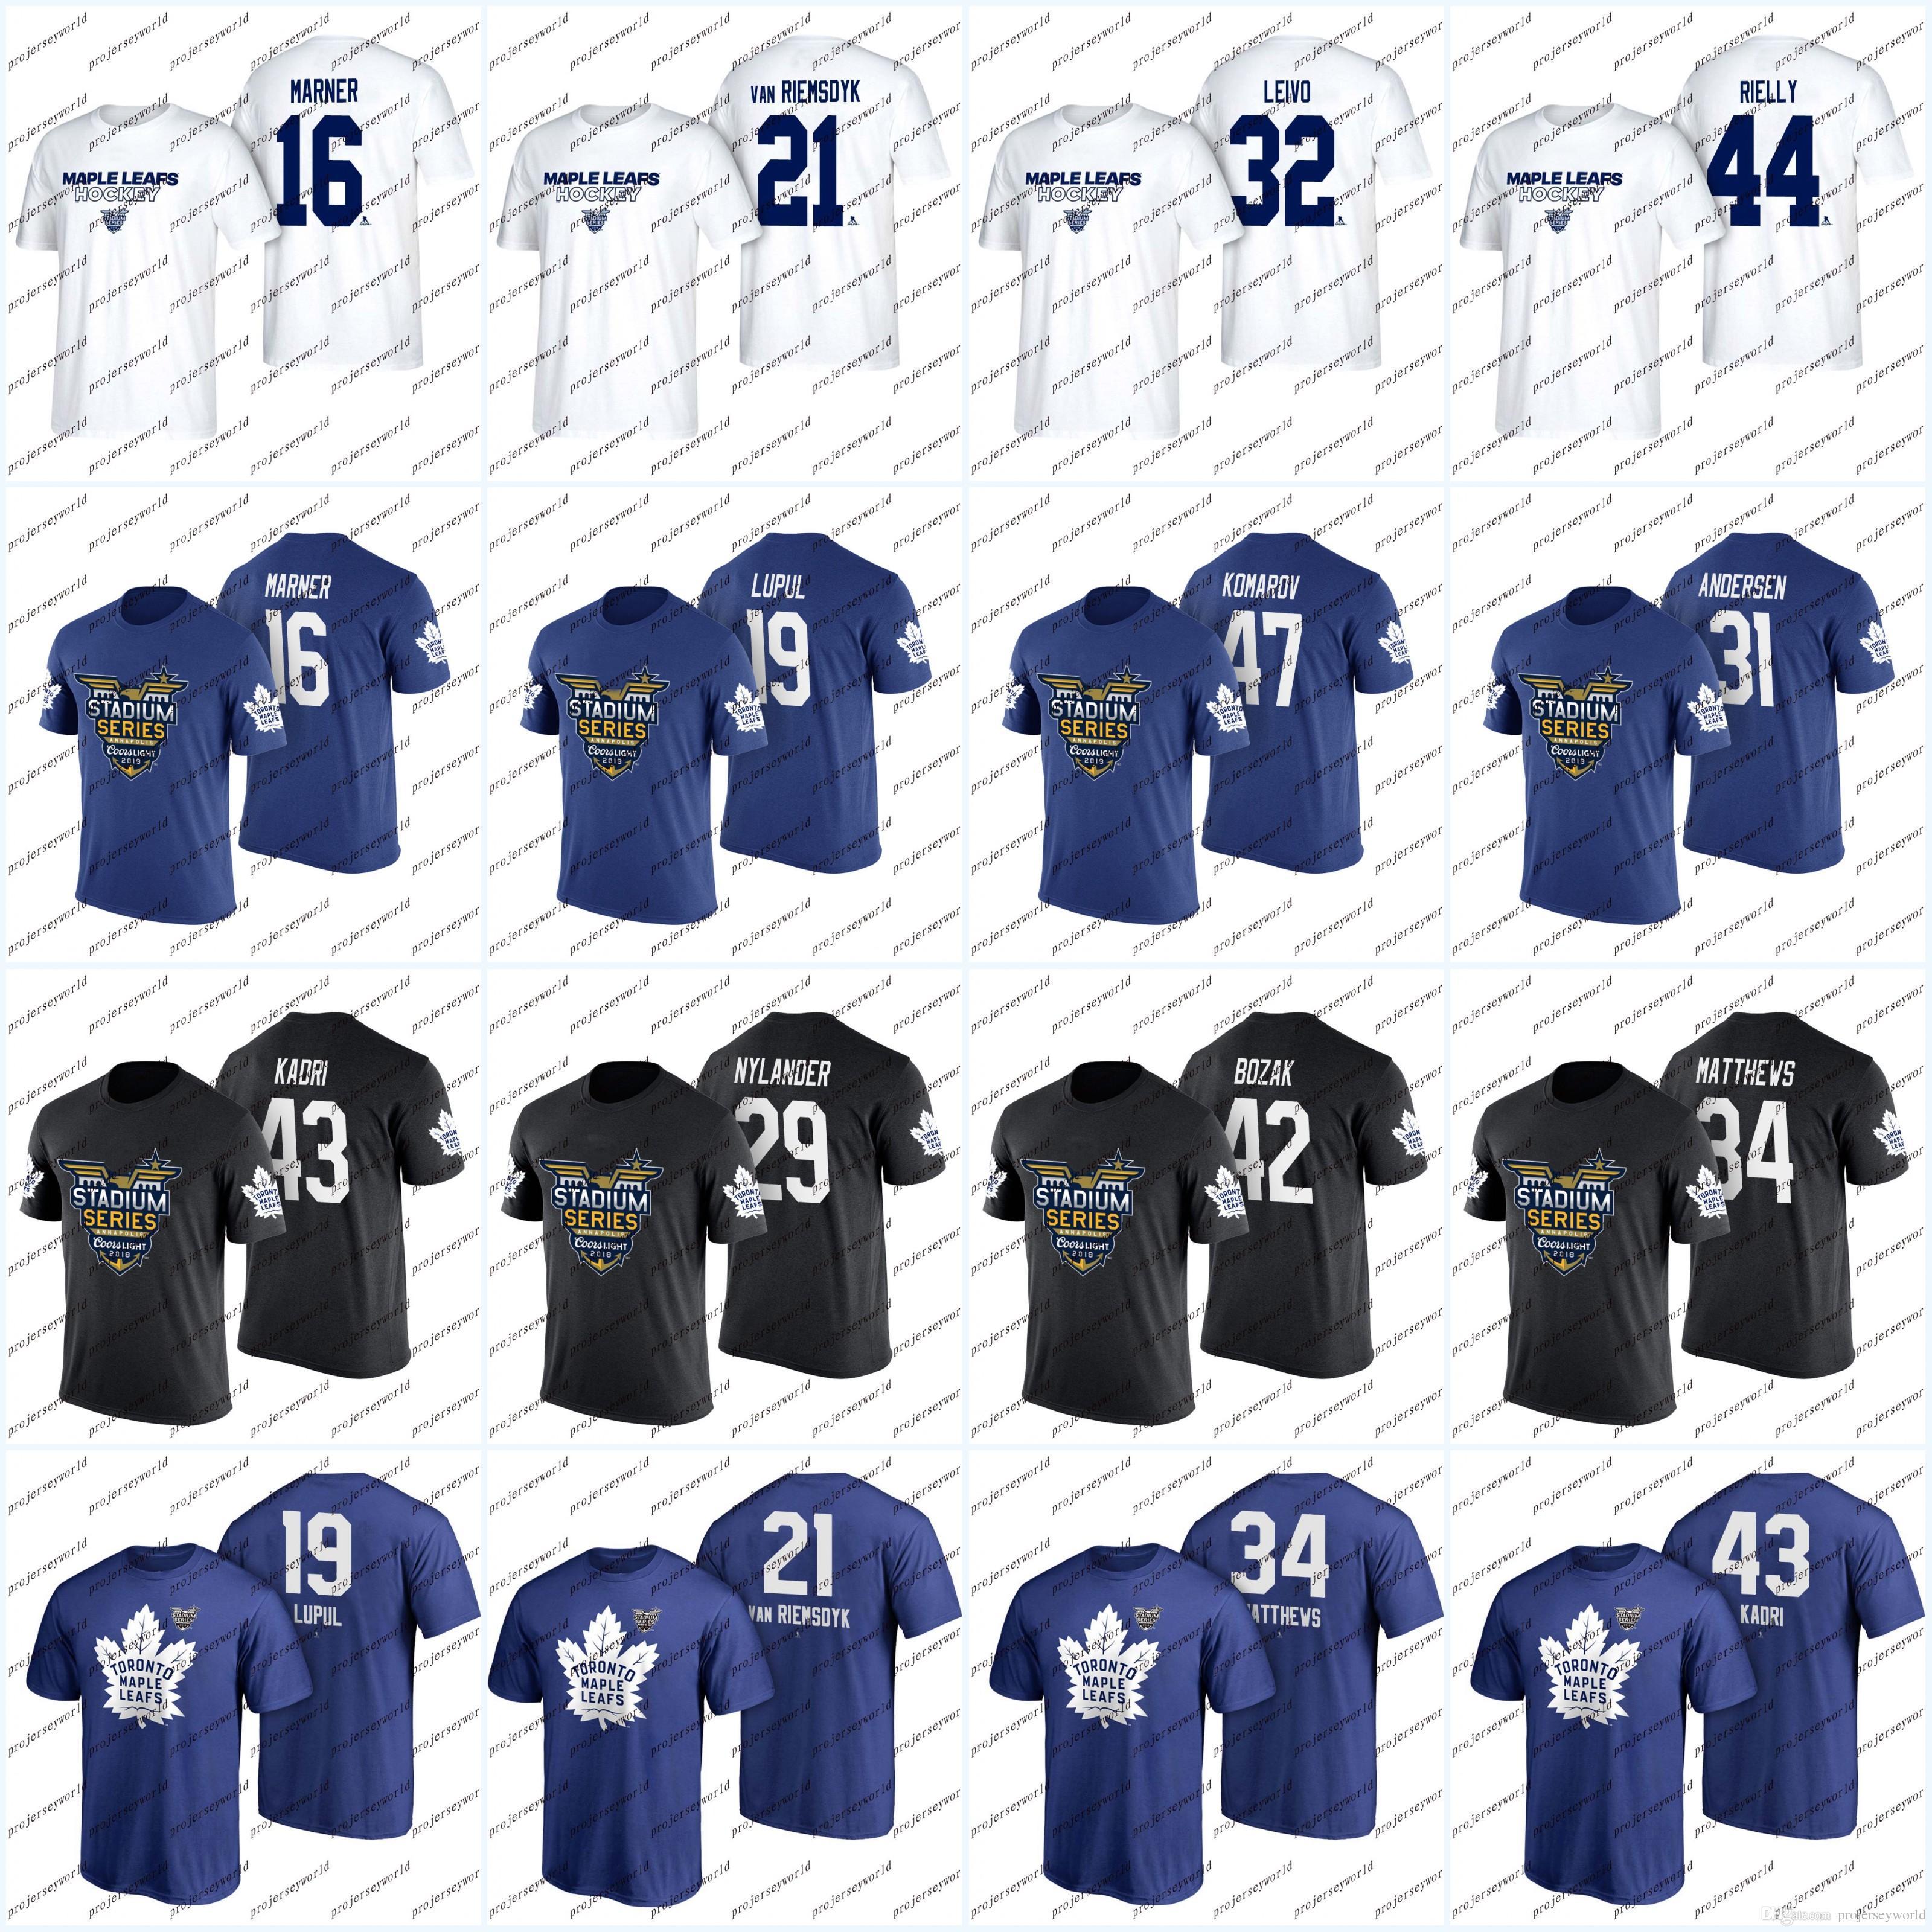 4e7e95d885a 29 William Nylander 2018 Stadium Series Toronto Maple Leafs T-shirt ...